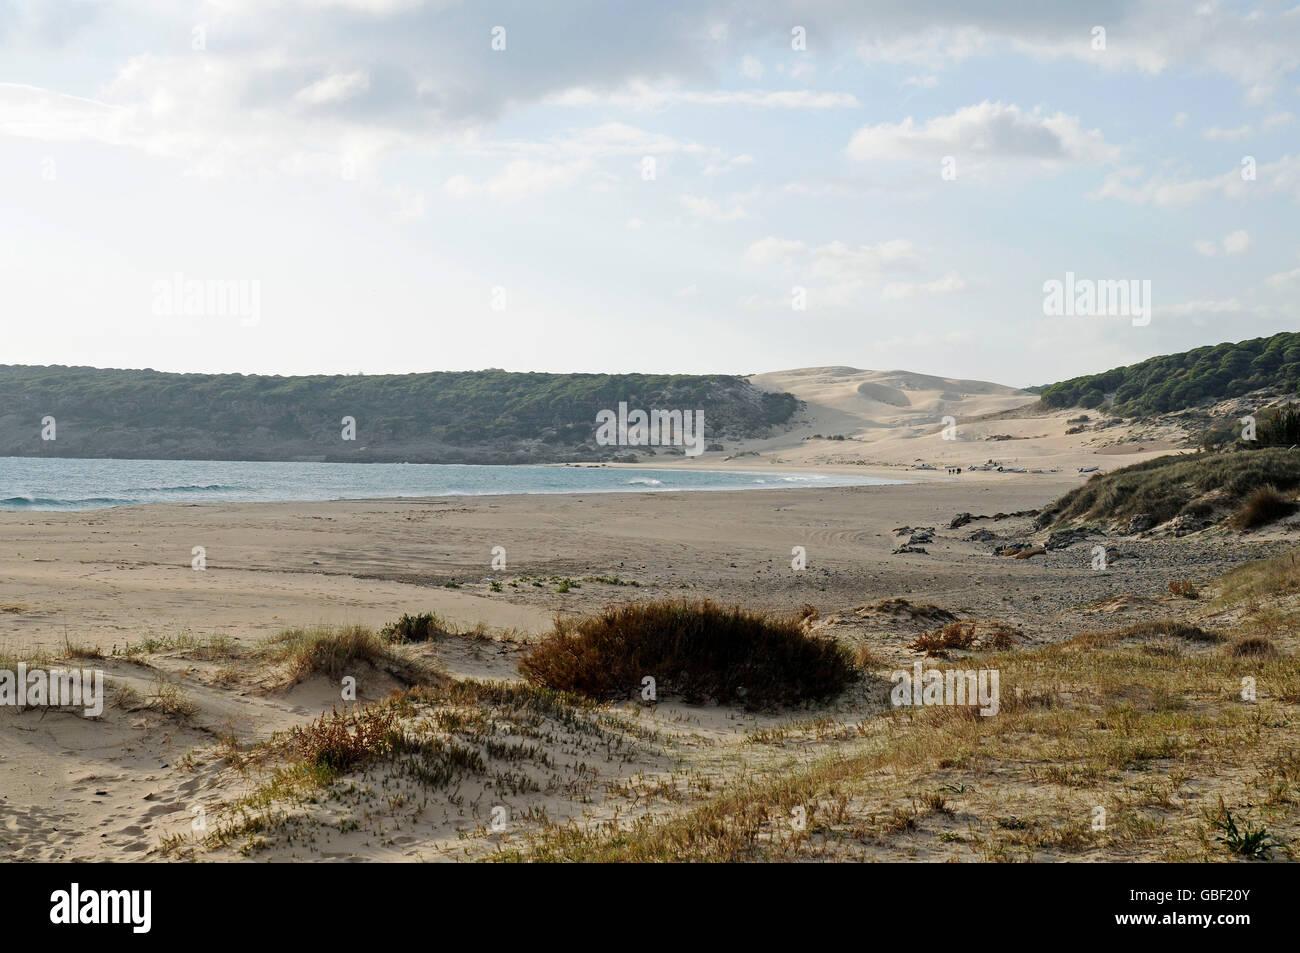 Playa de Bolonia, beach, Tarifa, Province of Cadiz, Costa de la Luz, Andalusia, Spain, Europe Stock Photo